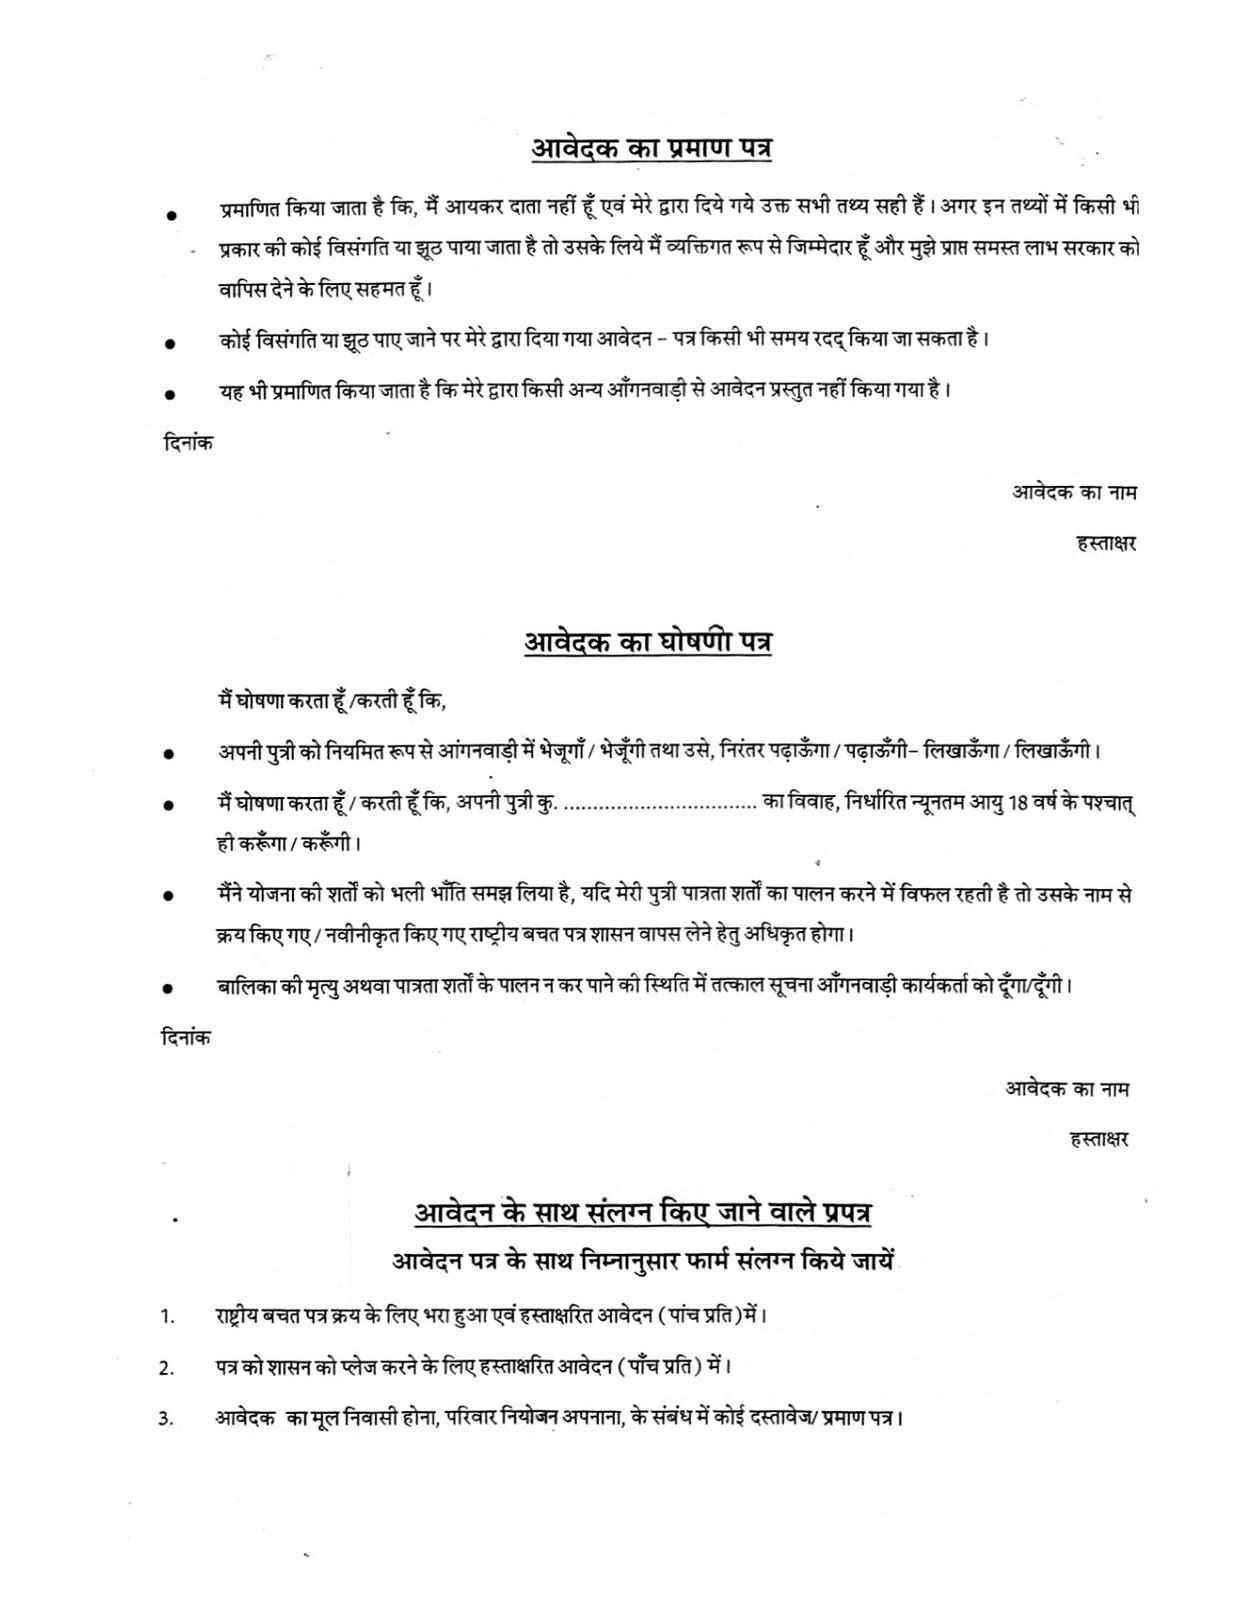 Ladli Laxmi Yojana Application Form